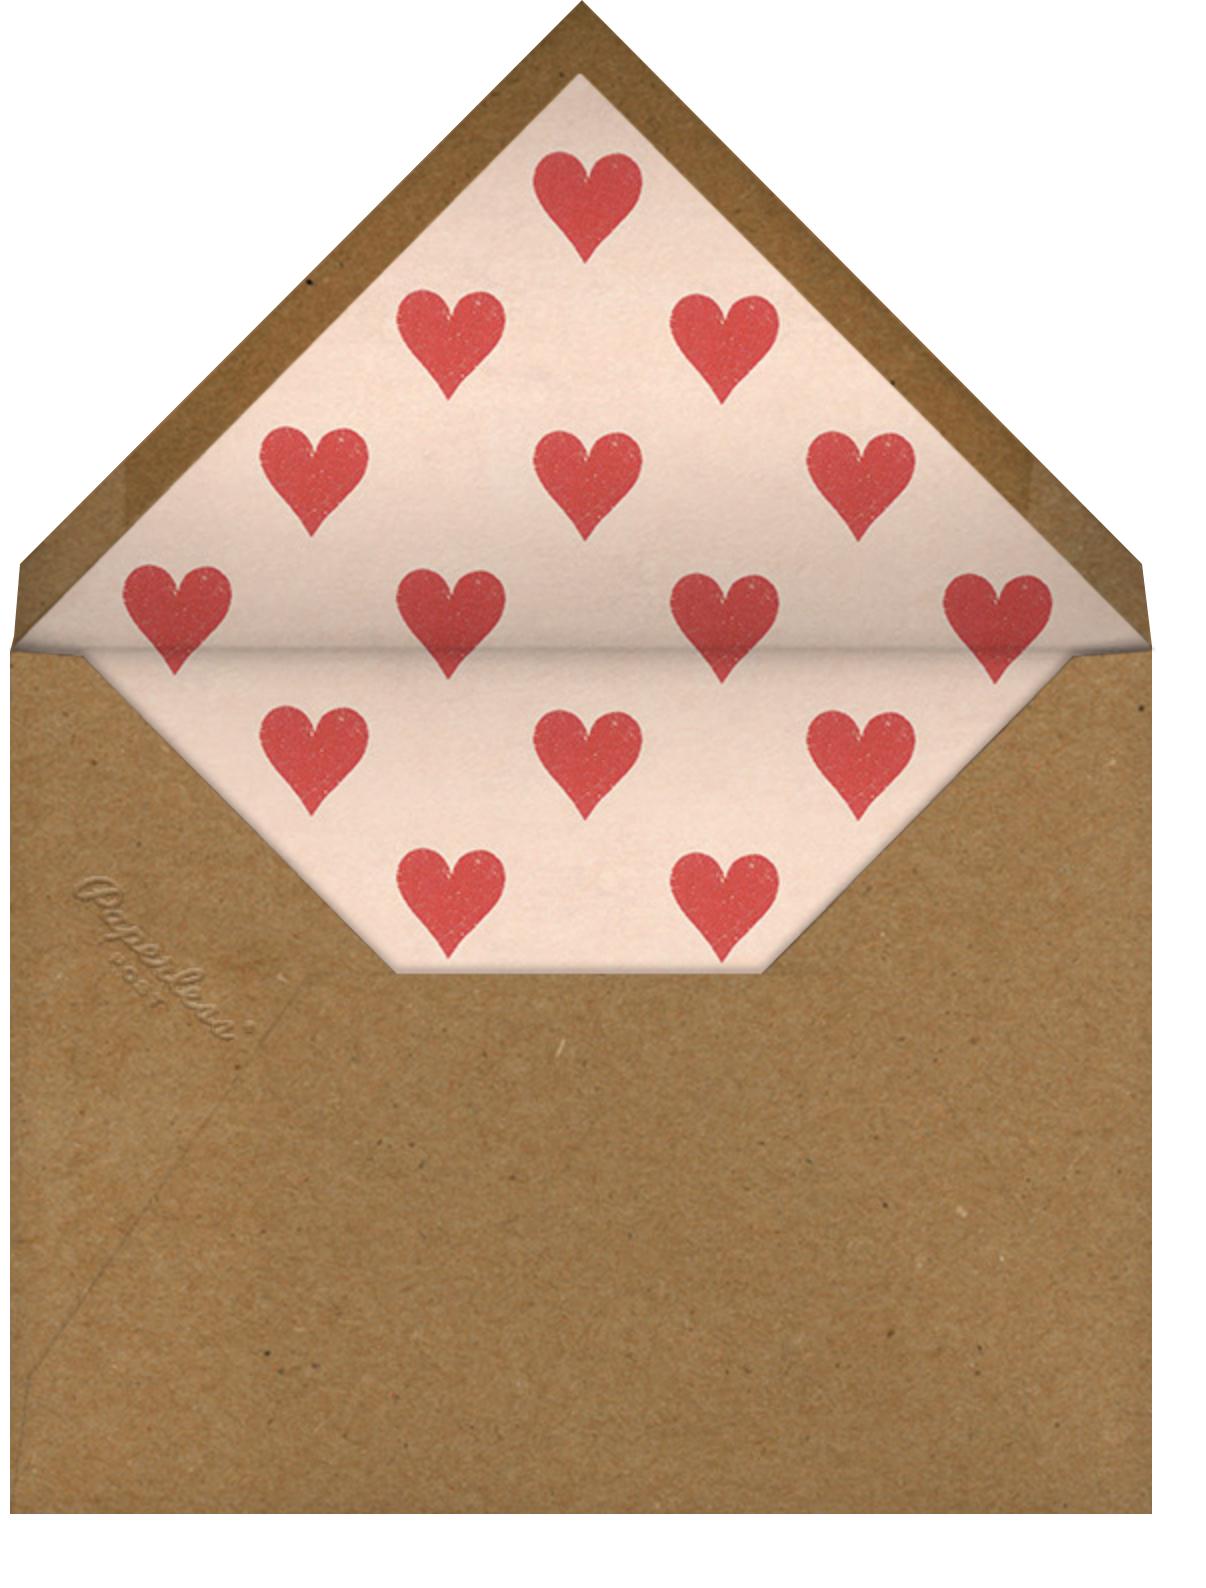 Engaged Hearts (Photo) - John Derian - Engagement party - envelope back